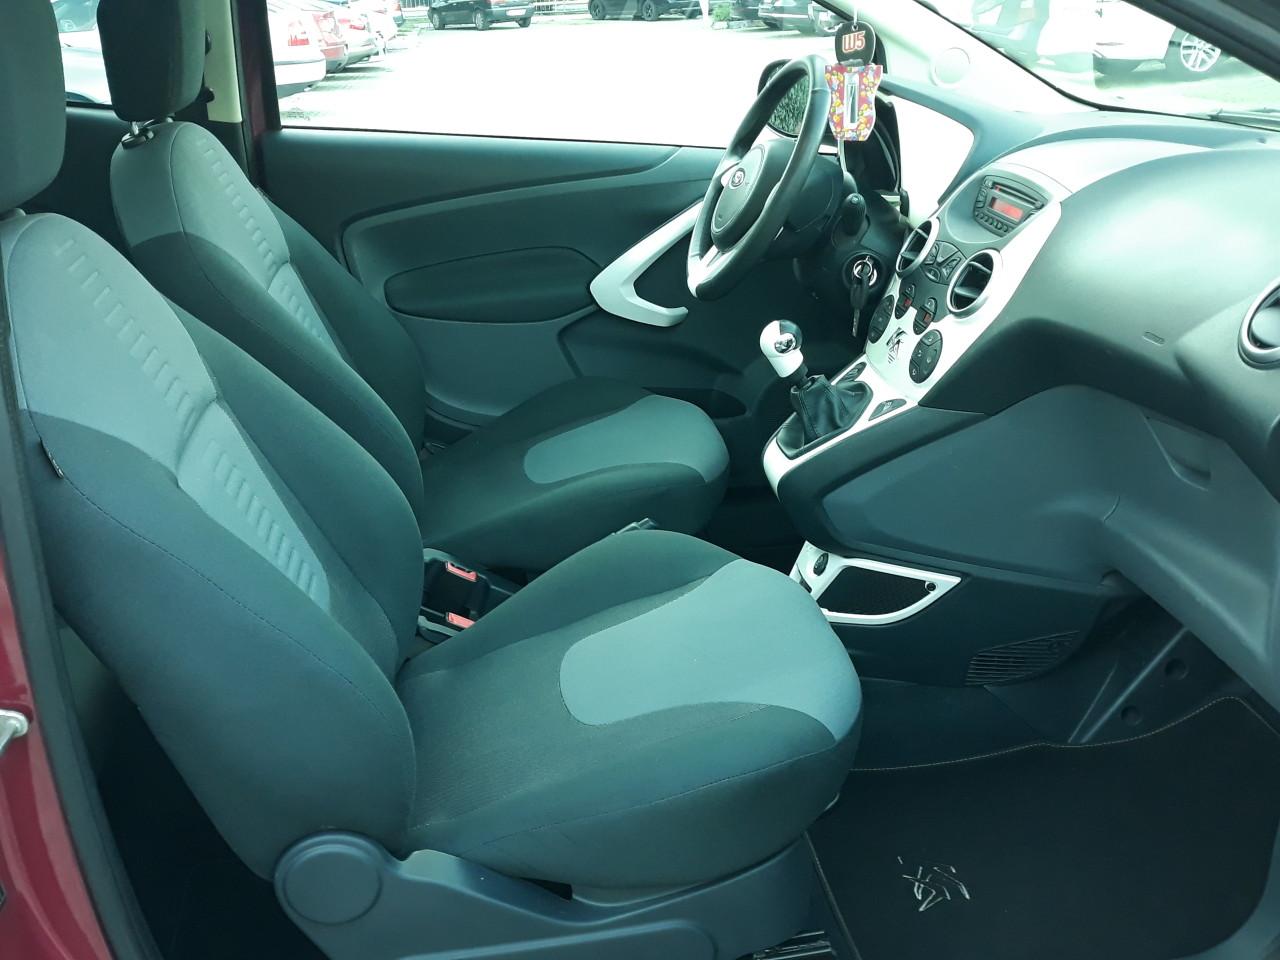 Ford KA TITANIUM 1.3Benzina 69Cp.Euro6.KLIMATRONIC.Panoramic 2014